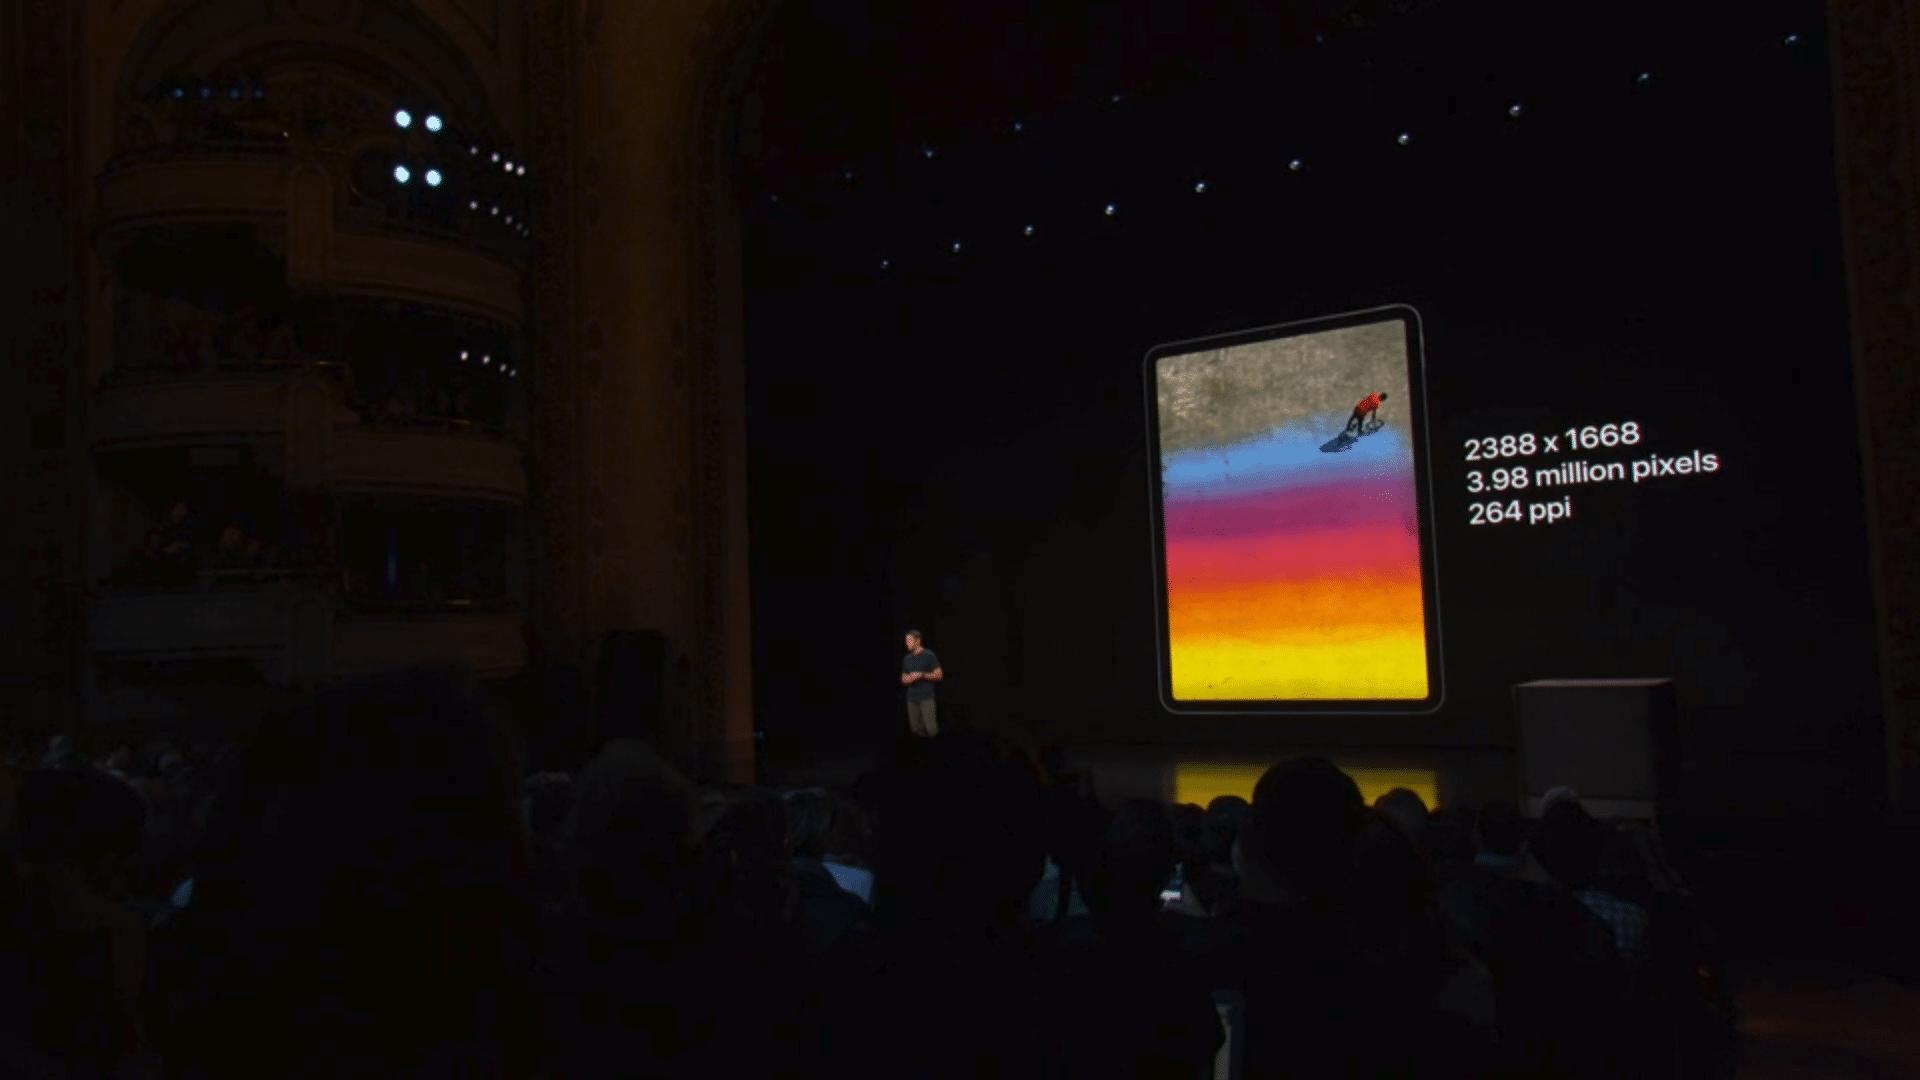 كل ماتريد معرفته عن iPad Pro 2018 4